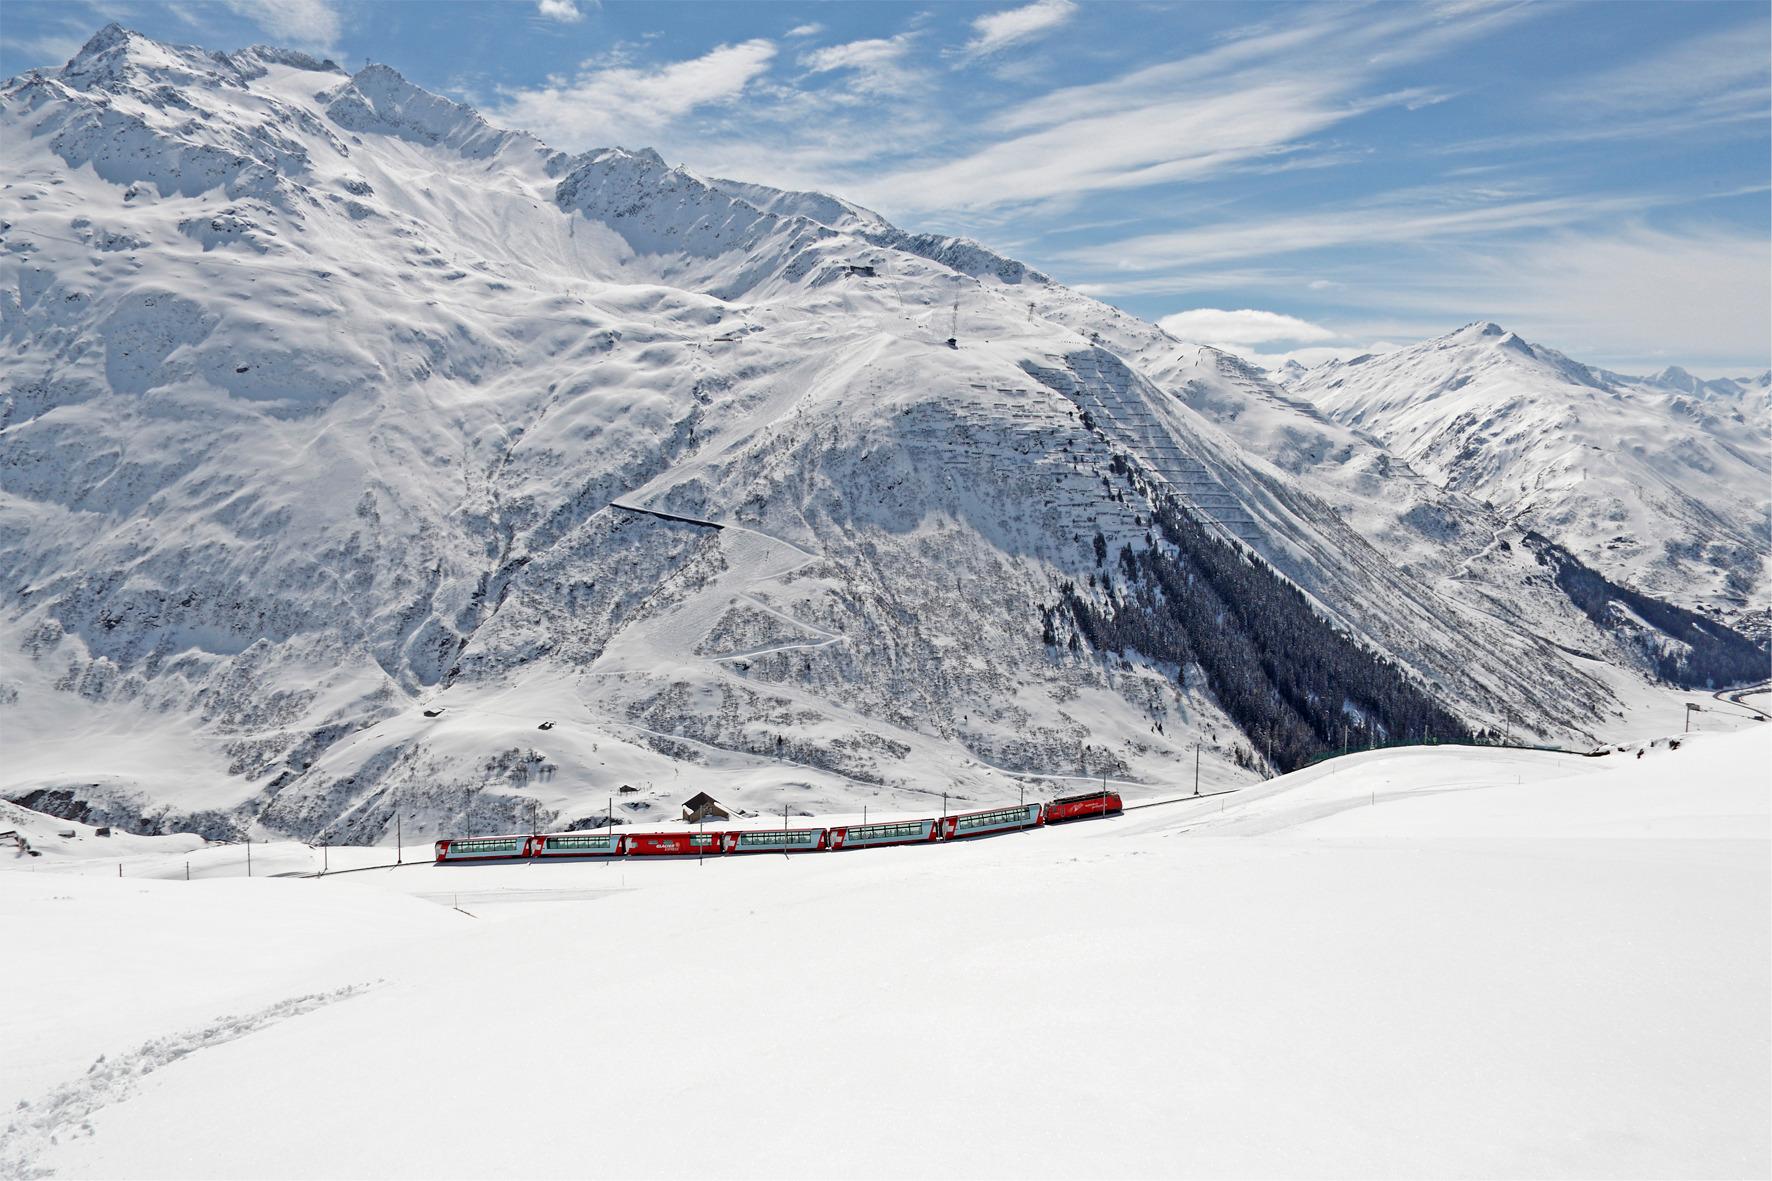 The 10 slow trains: Making tracks through Europe